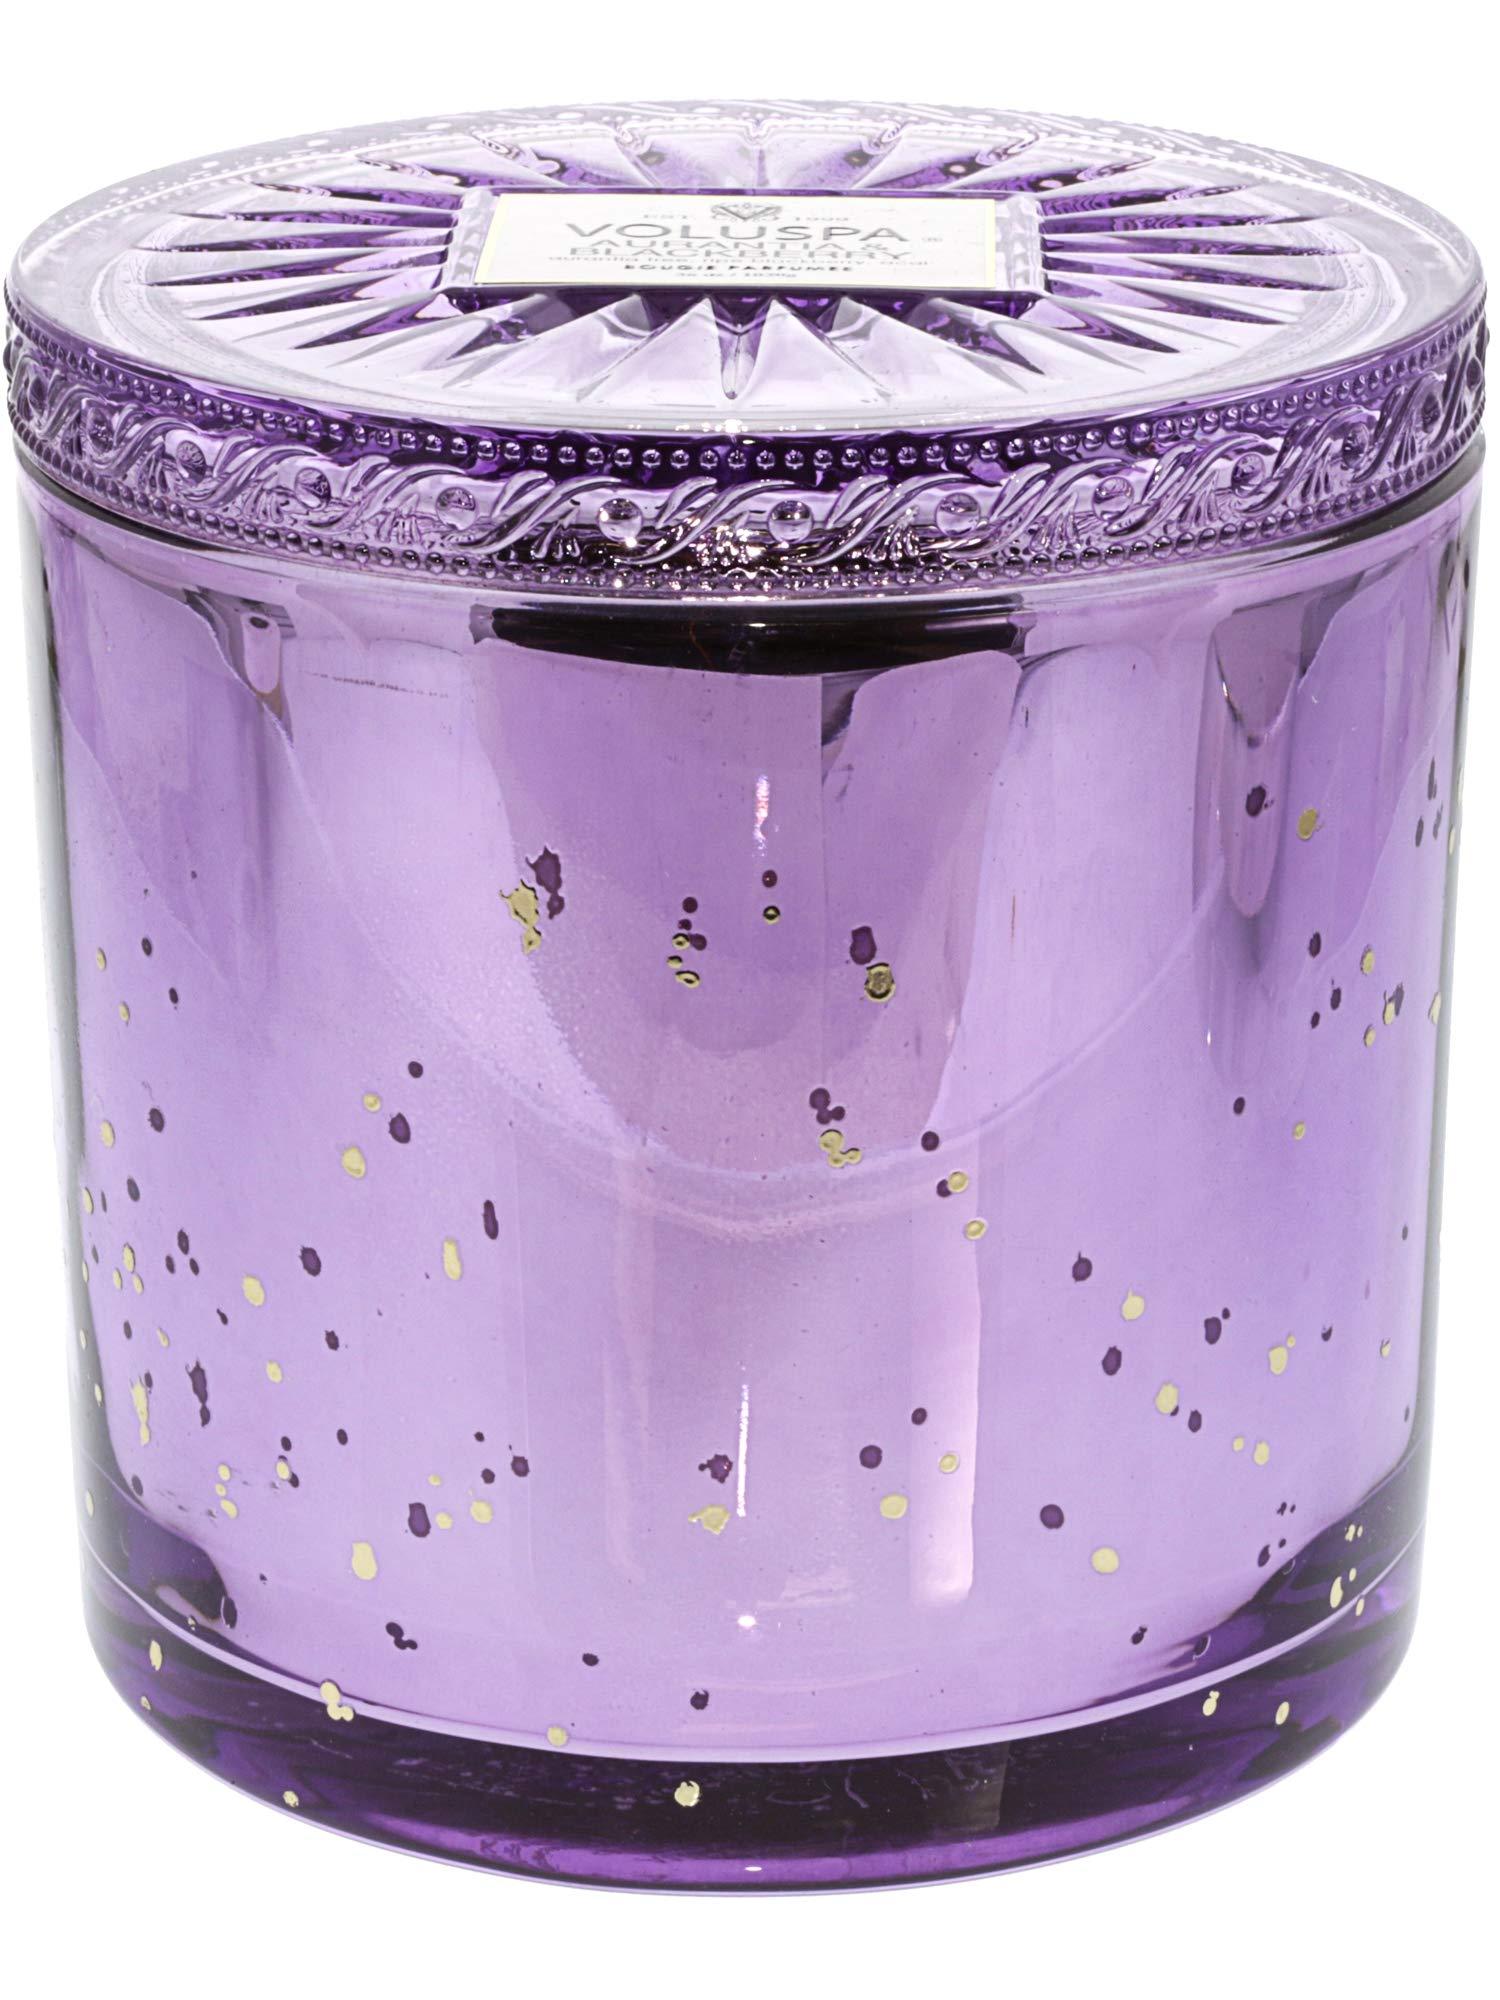 Voluspa Aurantia & Blackberry Grande Maison 3 Wick Glass Candle, 36 ounces